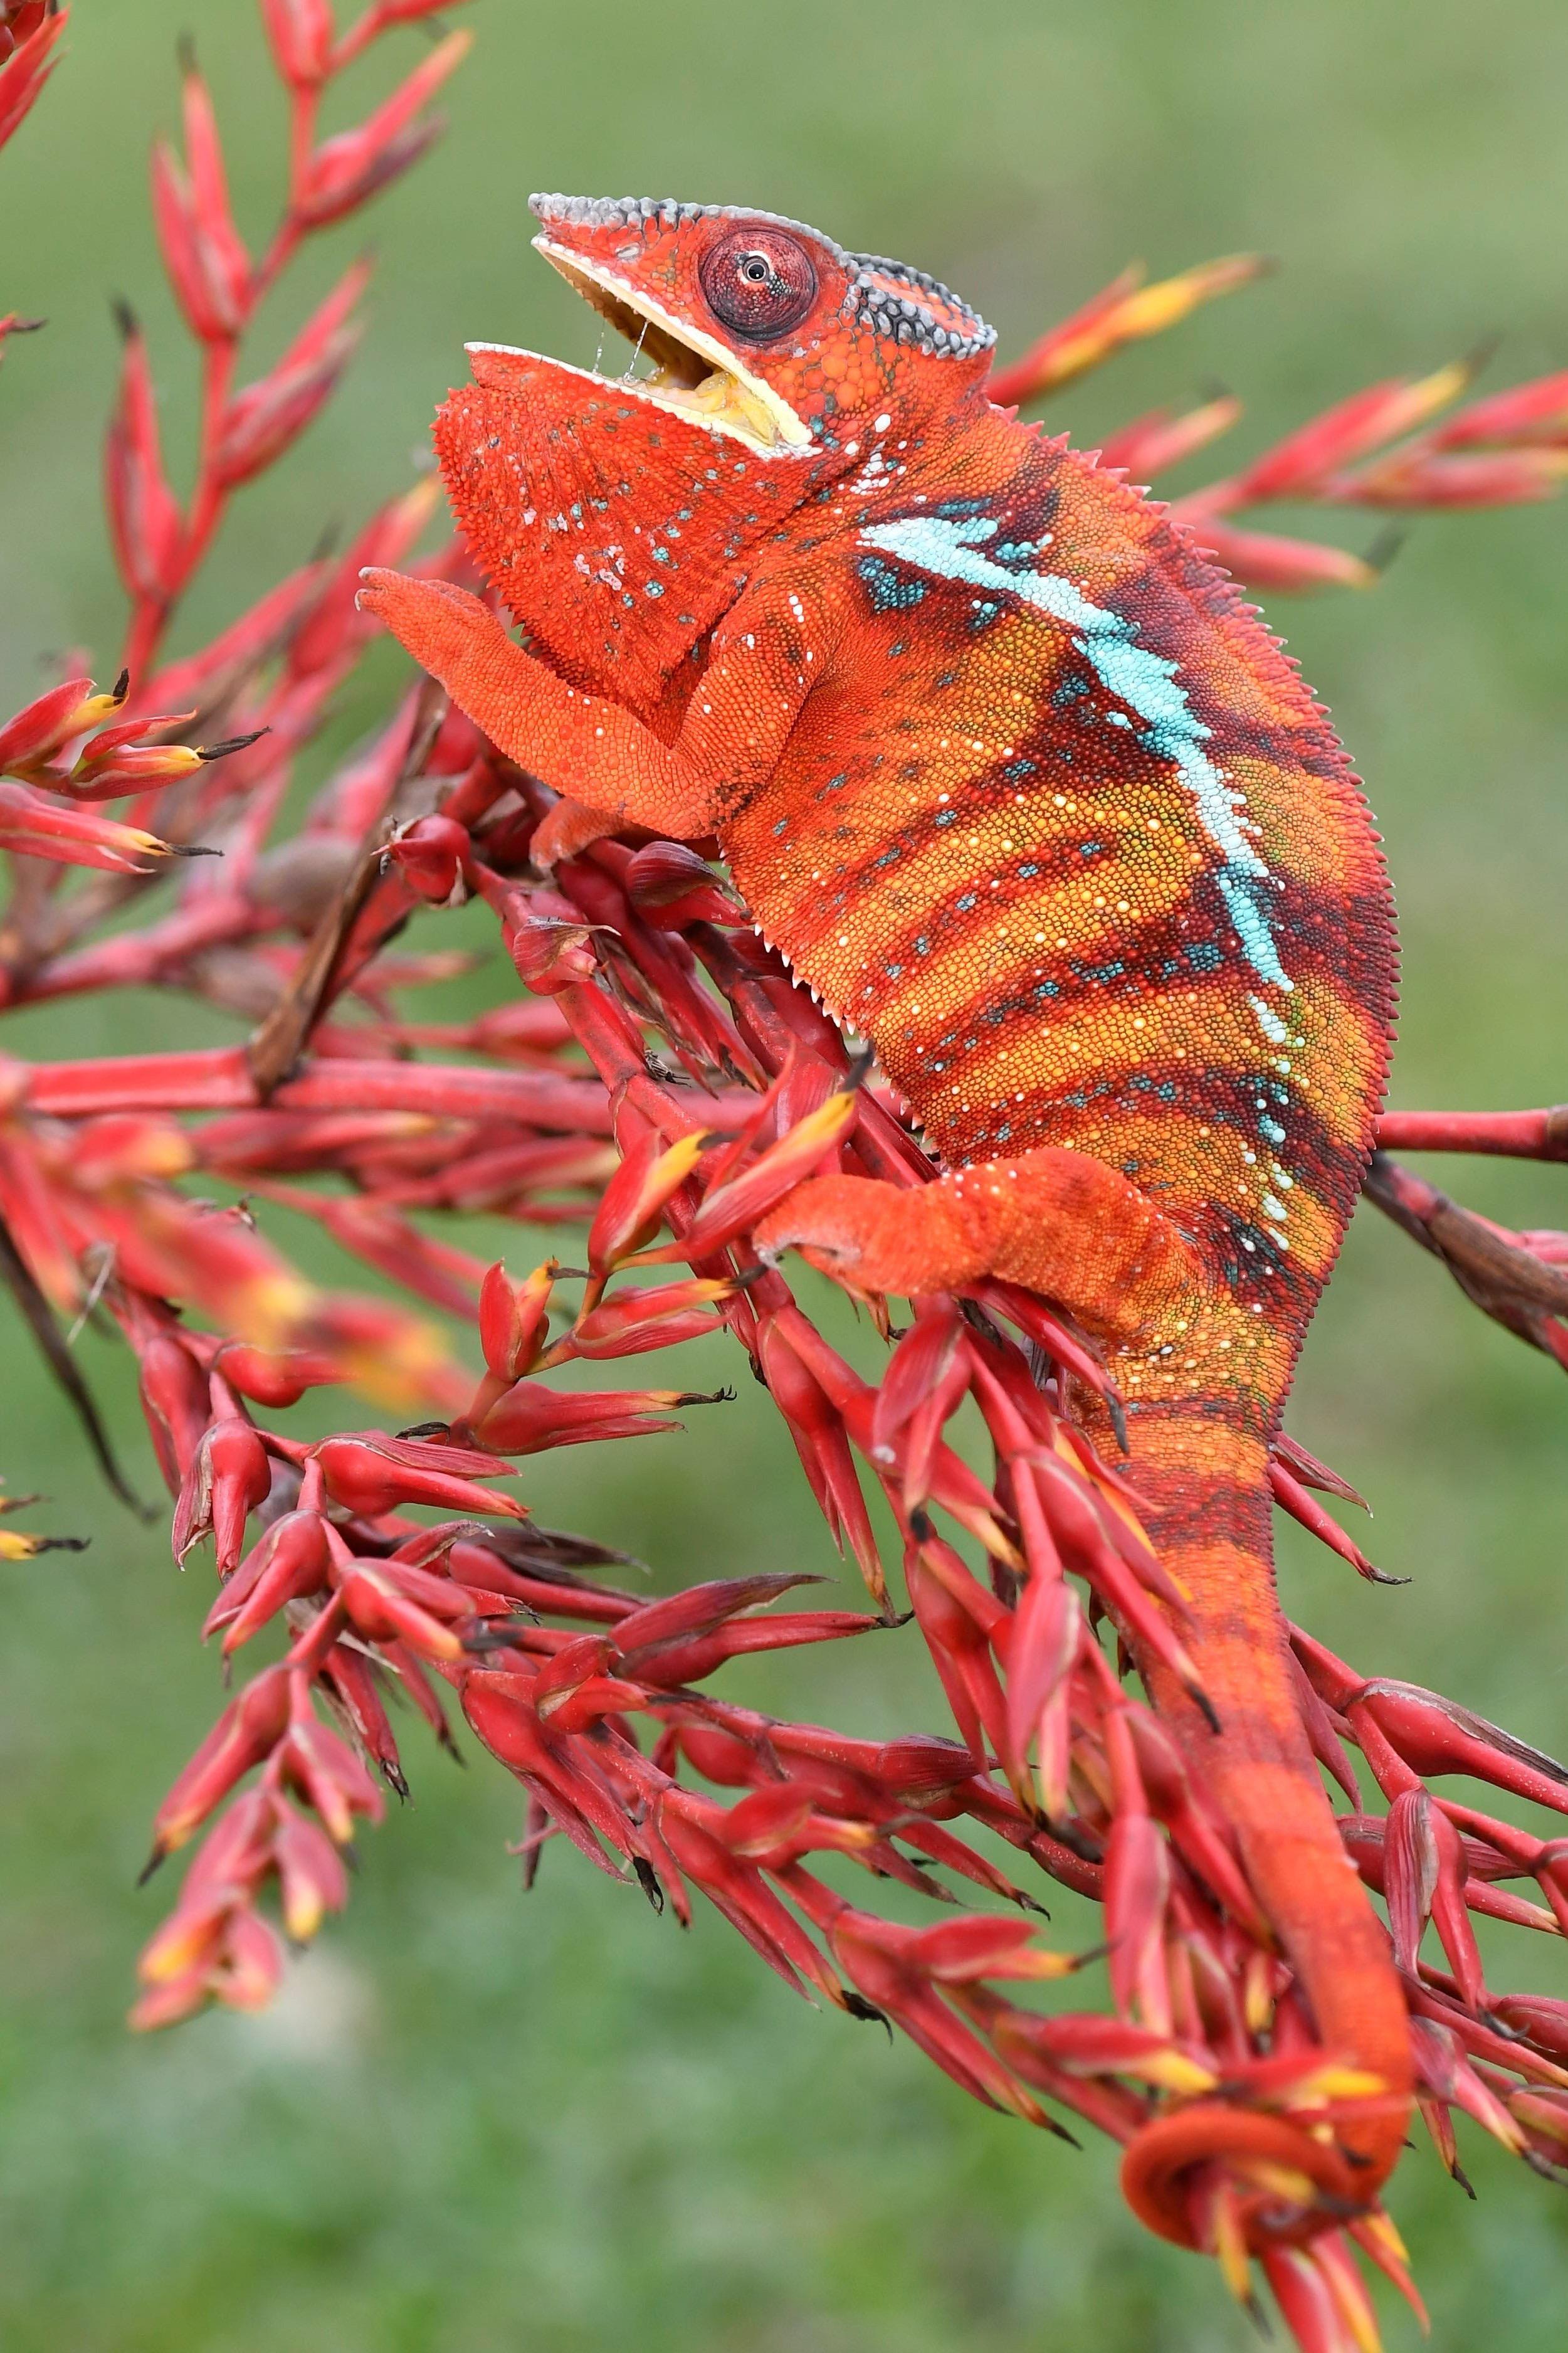 Chameleons communicate through biotremors they rapidly